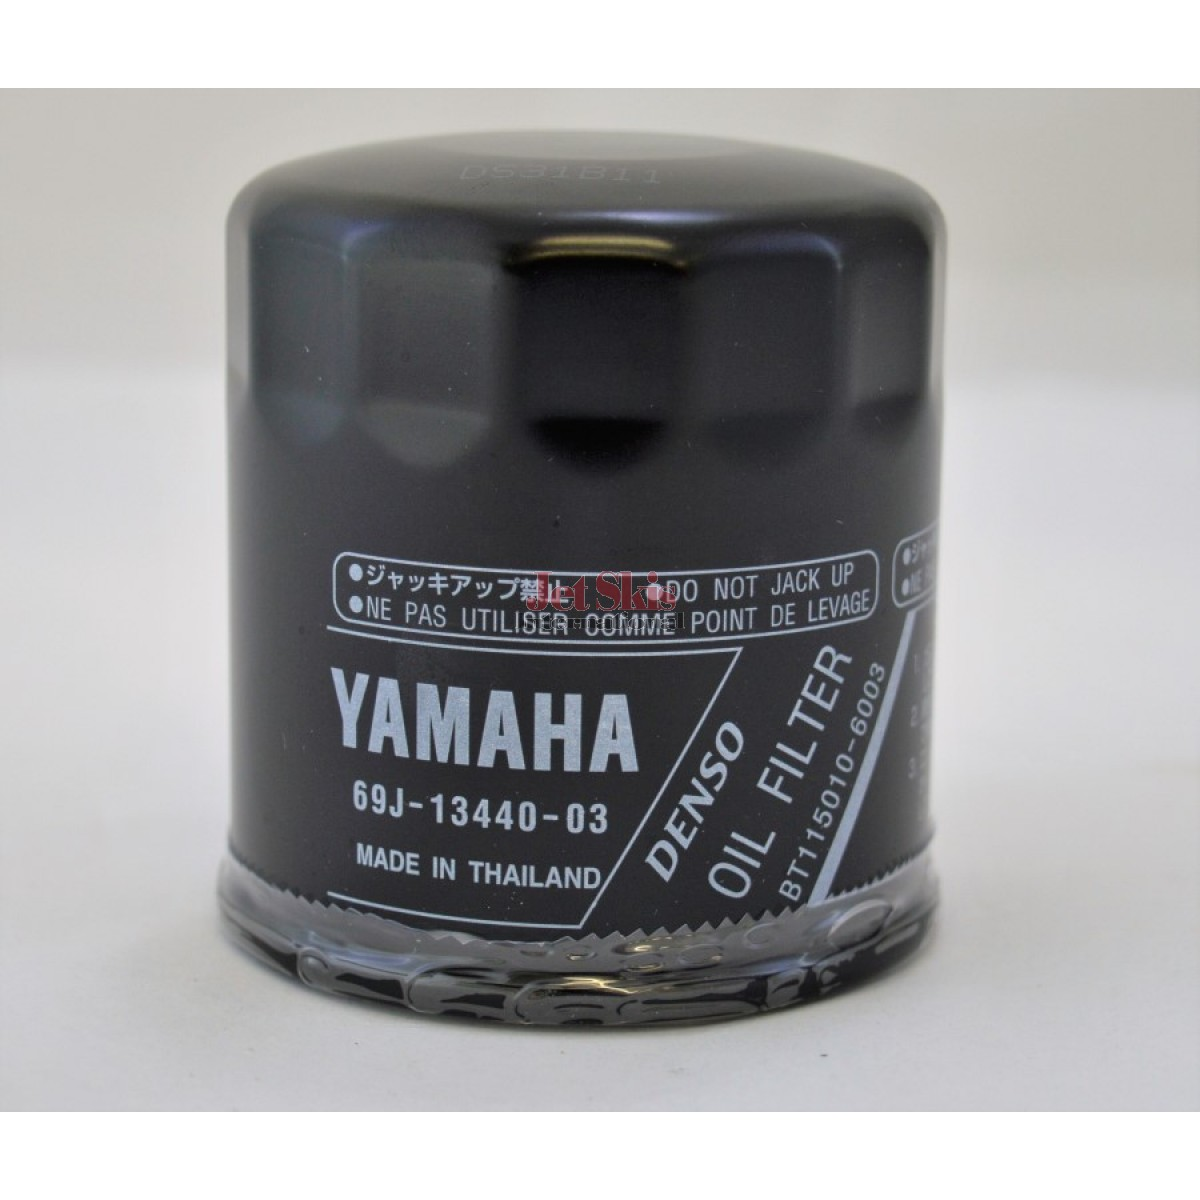 Retail Price Yamaha Oil Filter